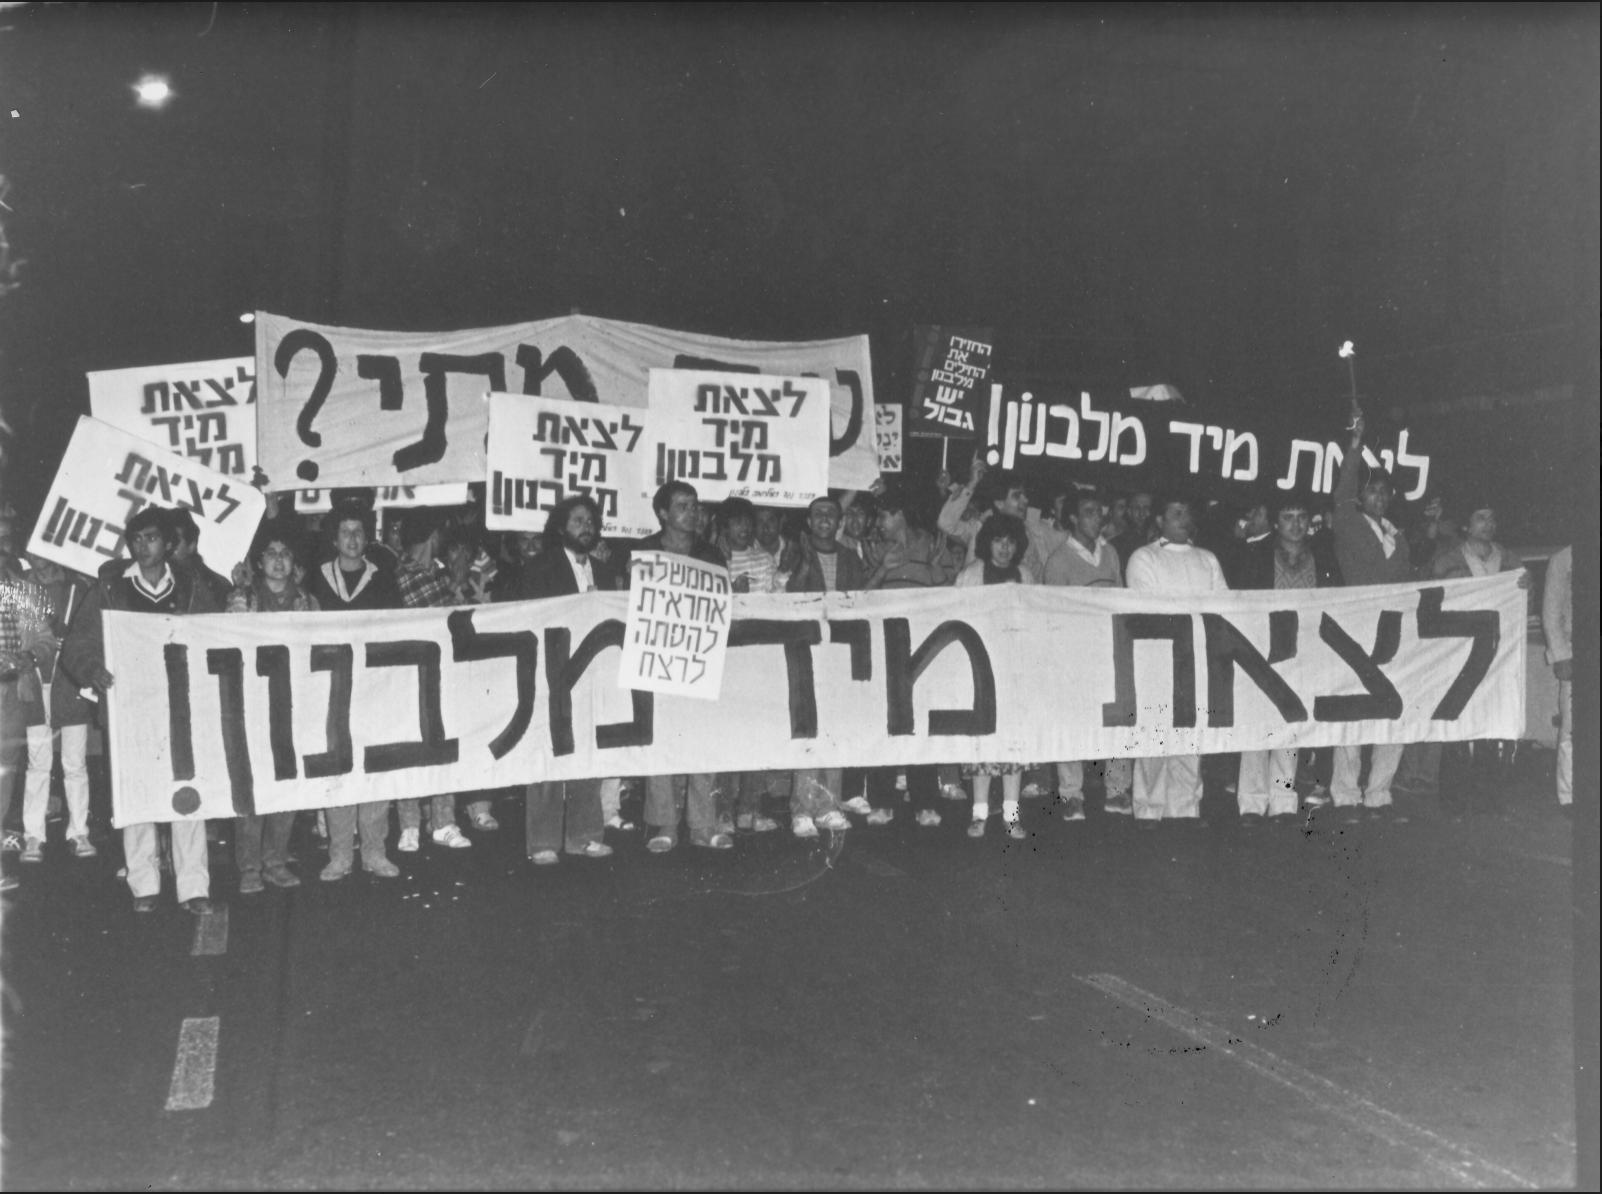 A demonstration against the First Lebanon War, October 12, 1983. (Andra Bertman, Hashomer Hatzair archives, Givat Haviva)